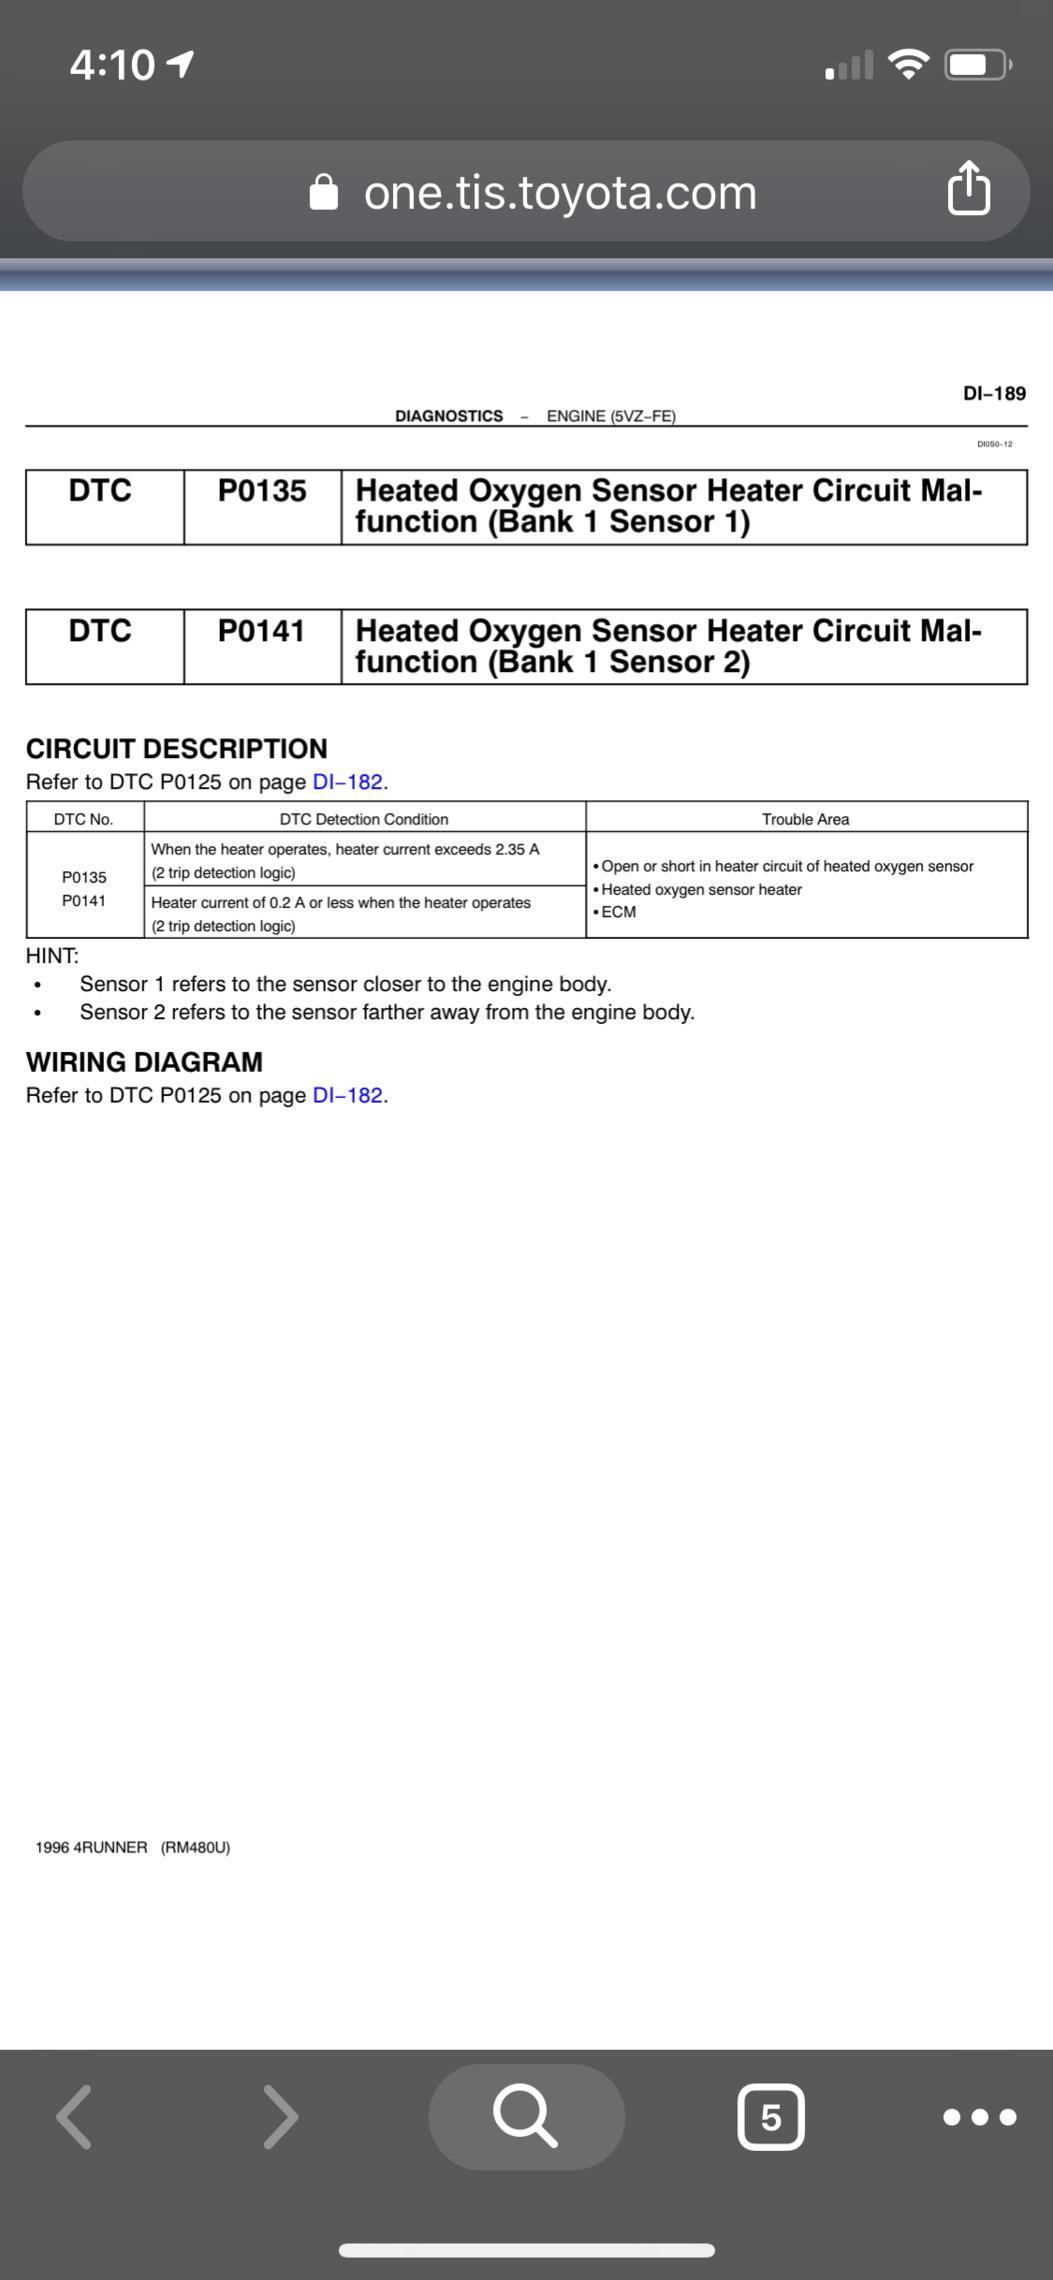 Check Engine Light & P0141 After O2 Sensor Replacement